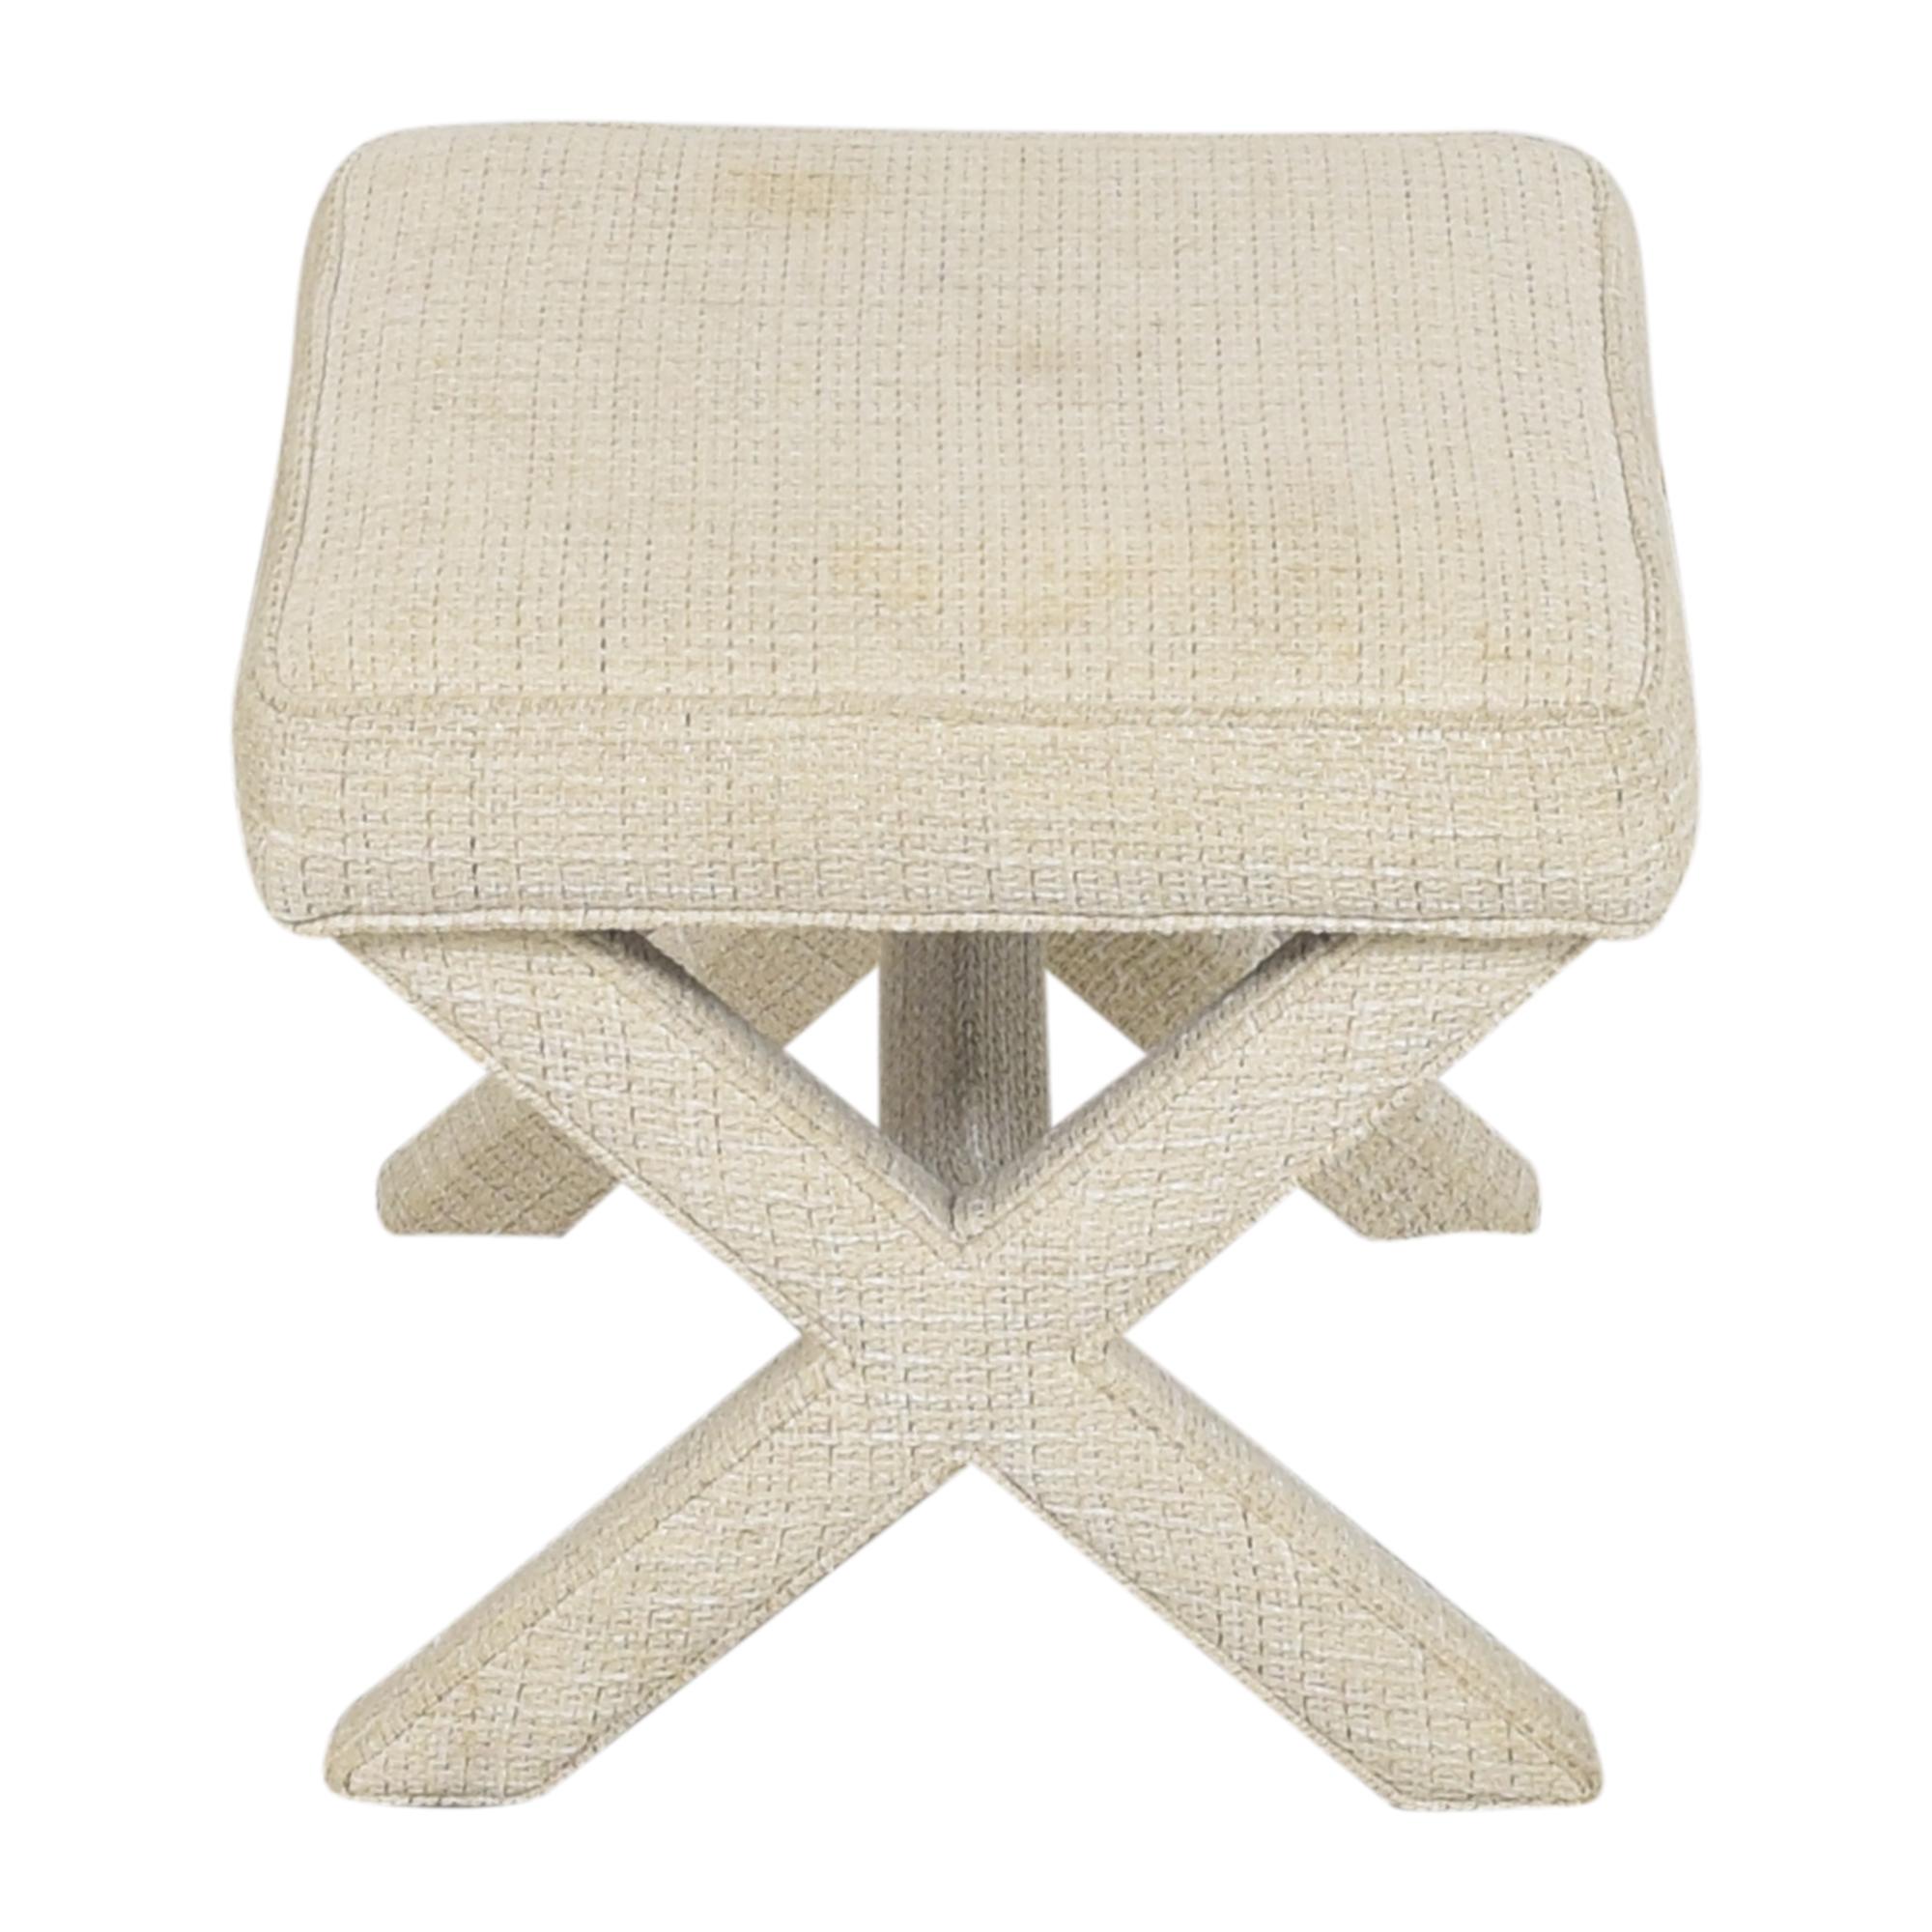 Ballard Designs Ballard Designs X Bench Chairs